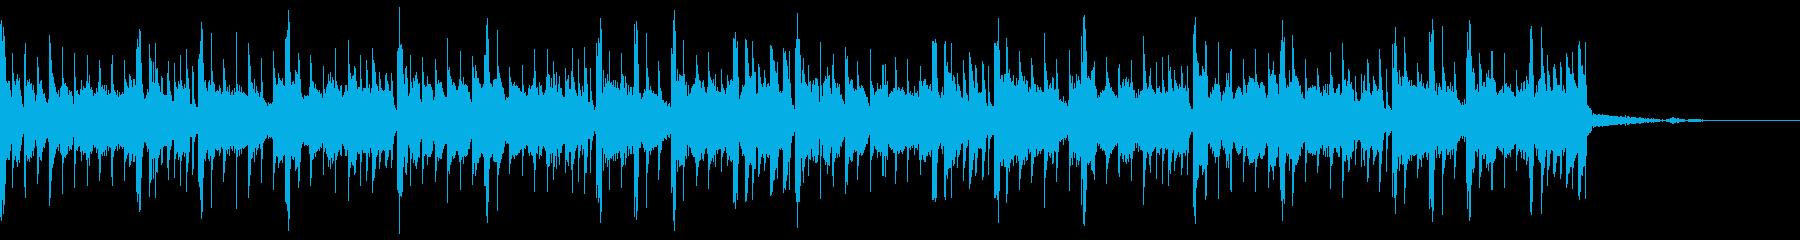 YoutubeのEDチックBeatの再生済みの波形